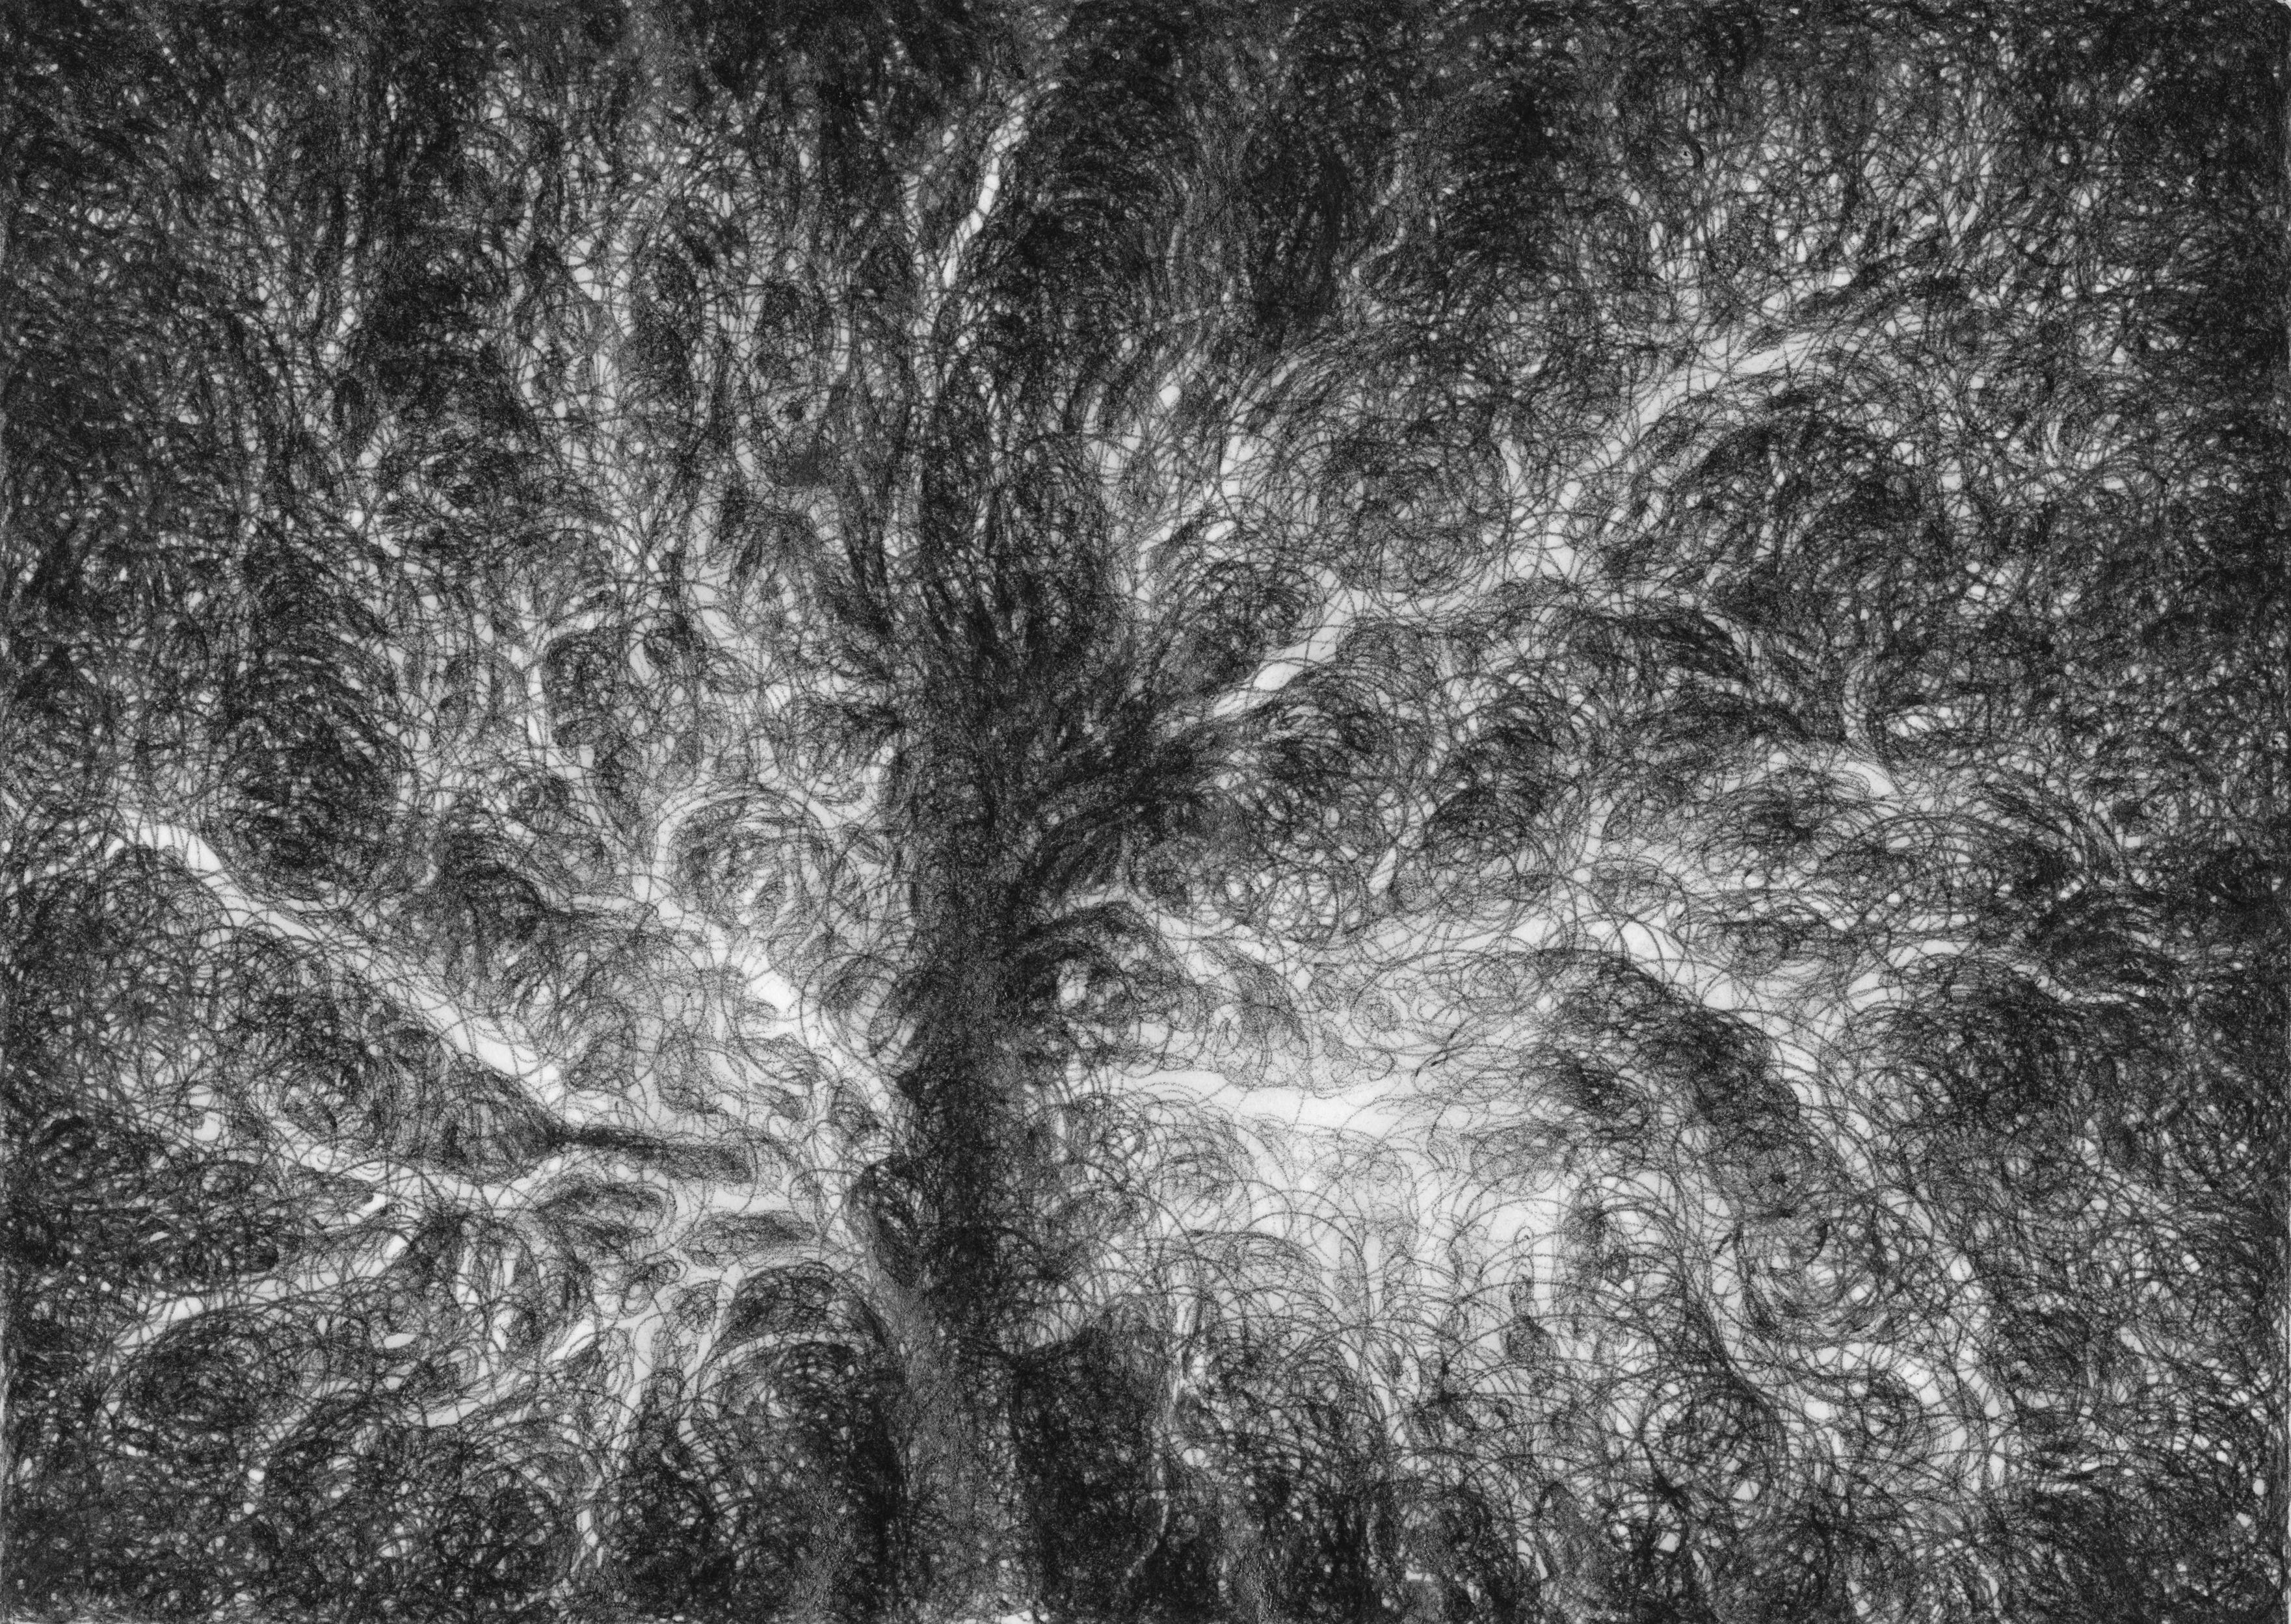 Tree Sketch (2)